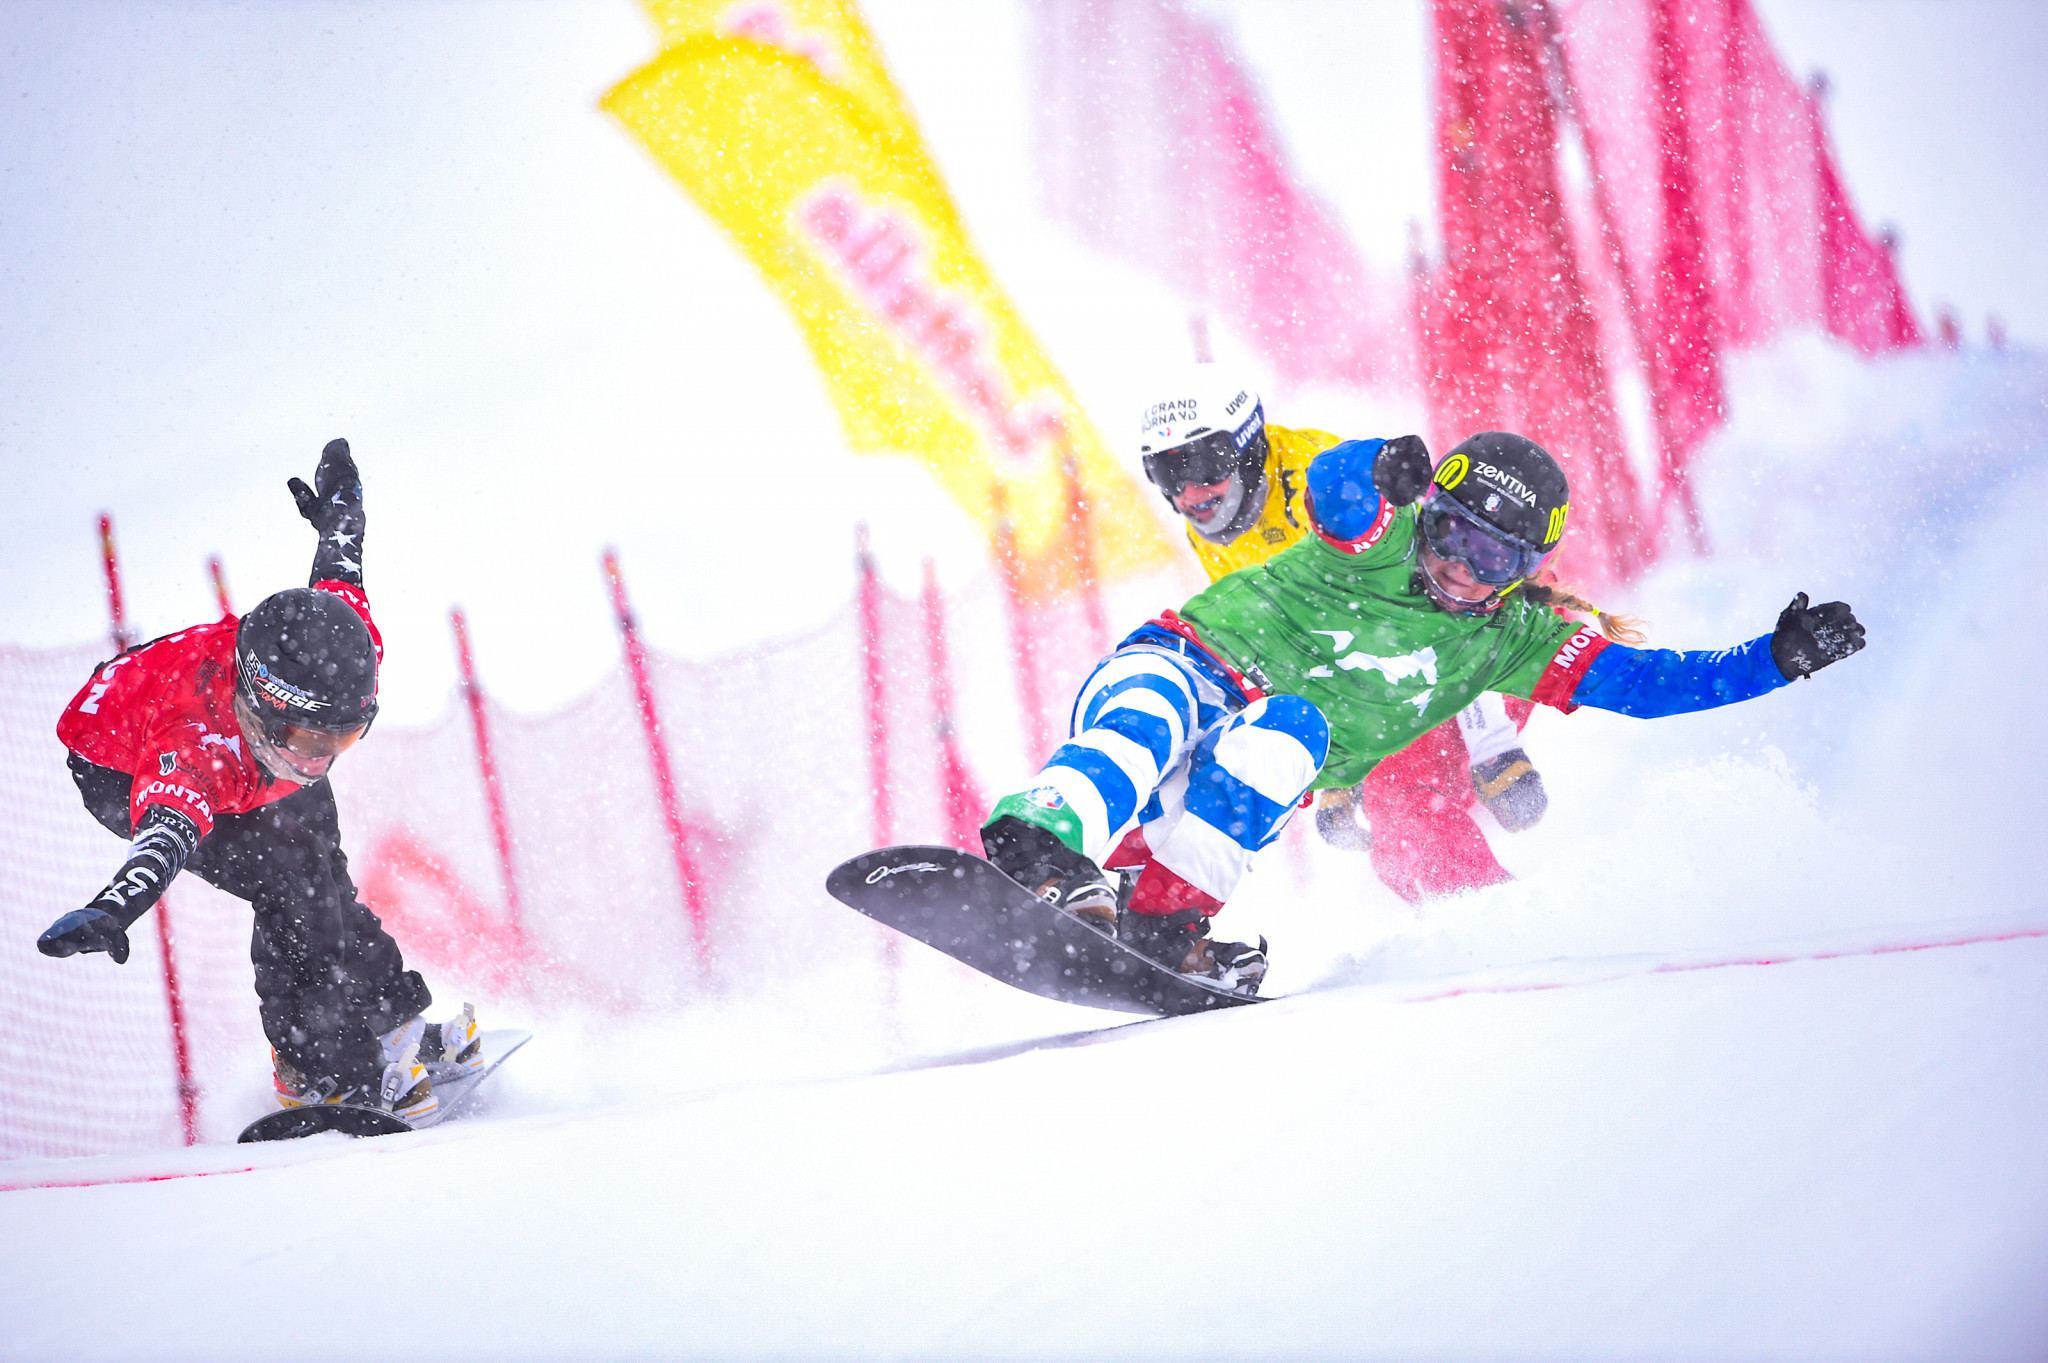 Moioli and Vaultier earn FIS Snowboard Cross World Cup wins at Feldberg ahead of Pyeongchang 2018 test